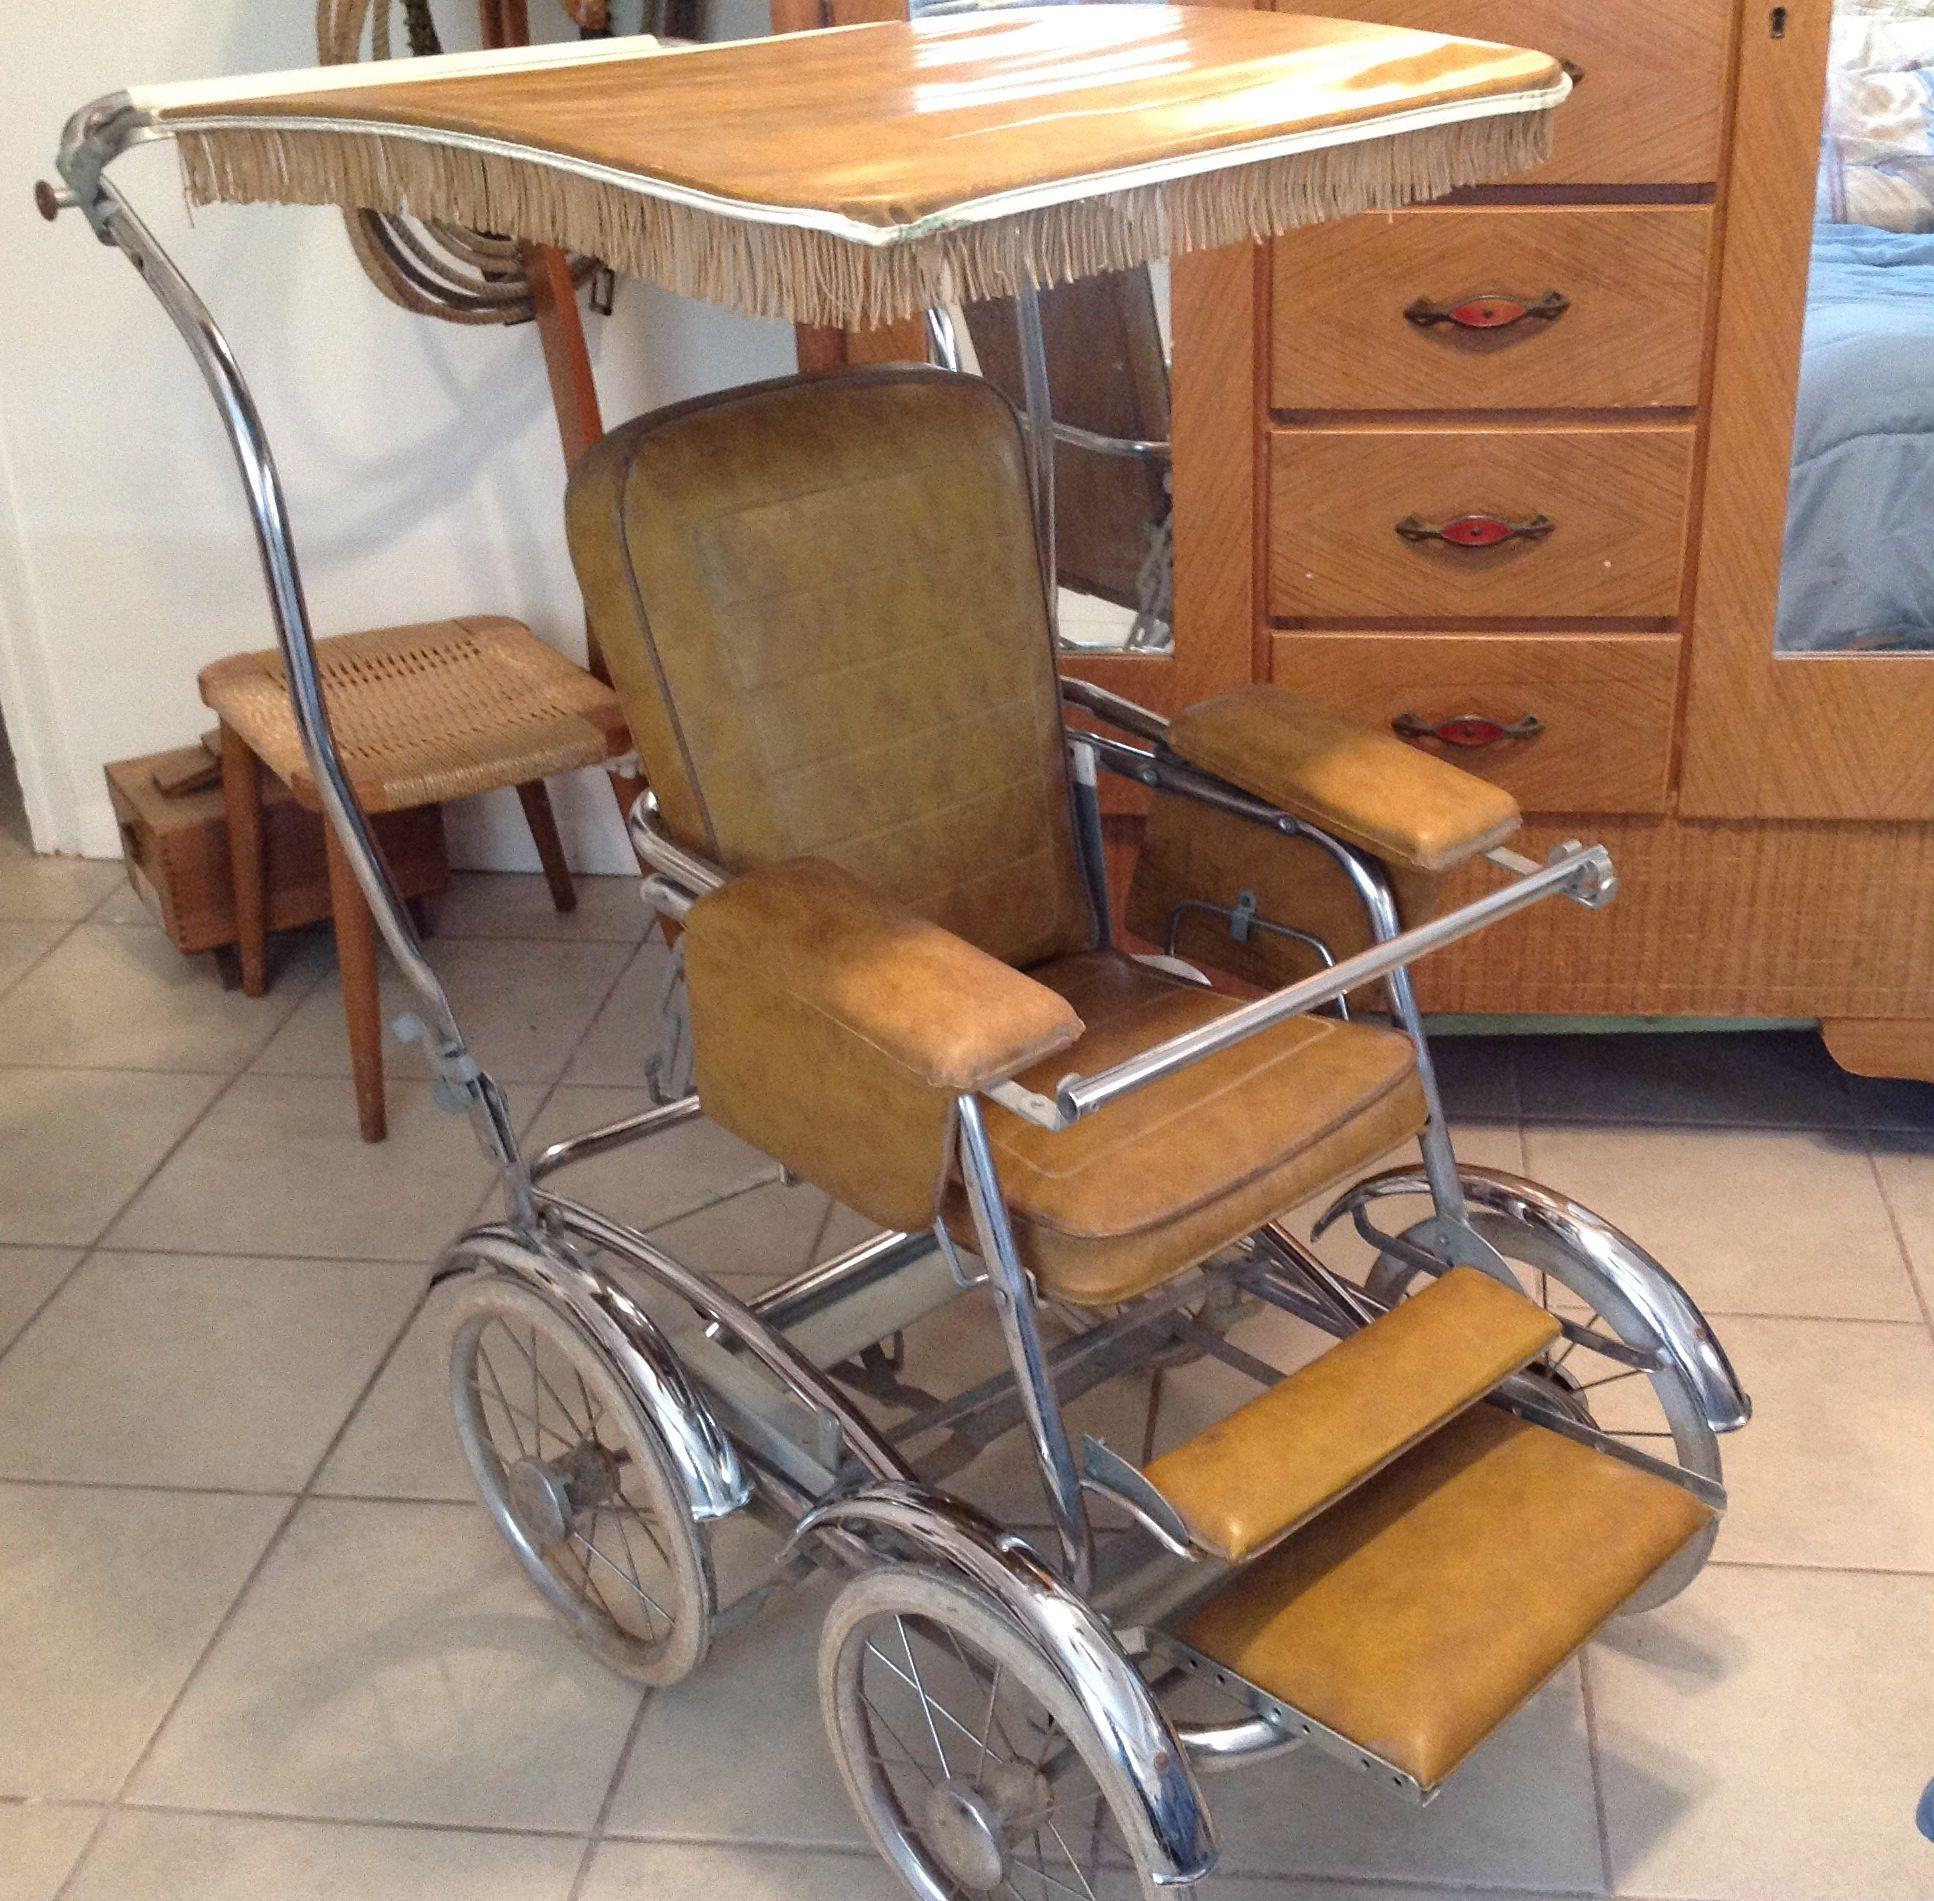 Vintage stroller, 1960's. Antique and Vintage Baby/Doll